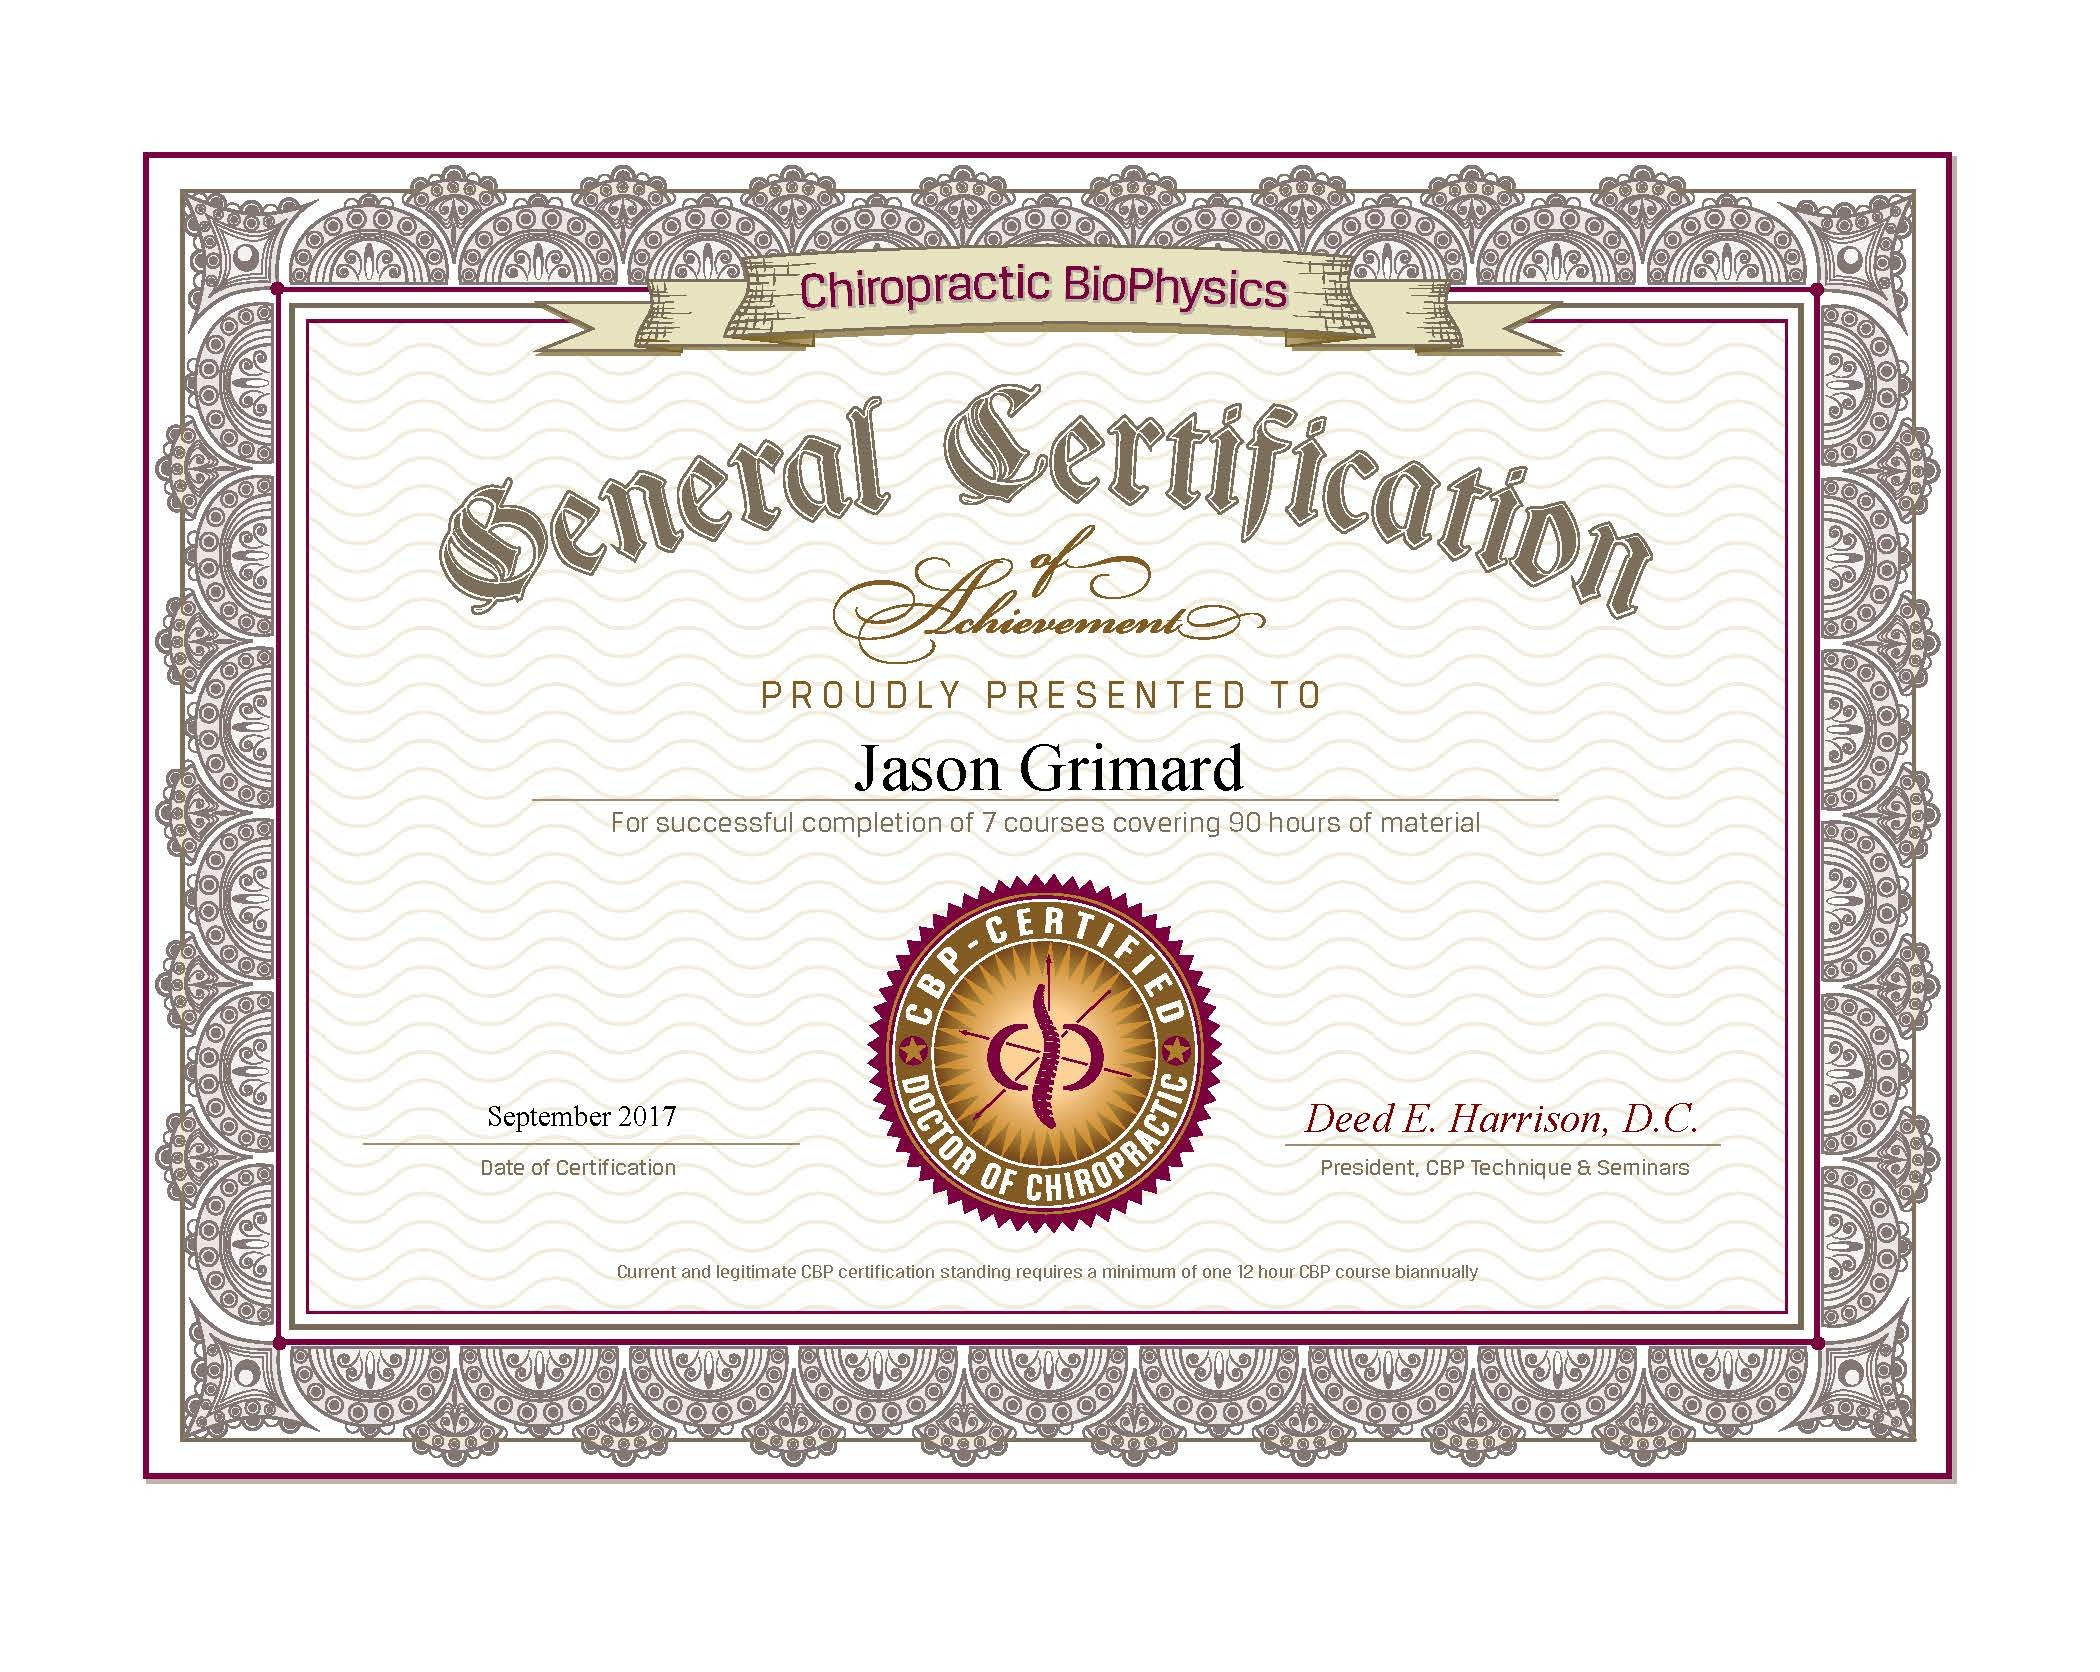 Jason grimard basic certified certificate